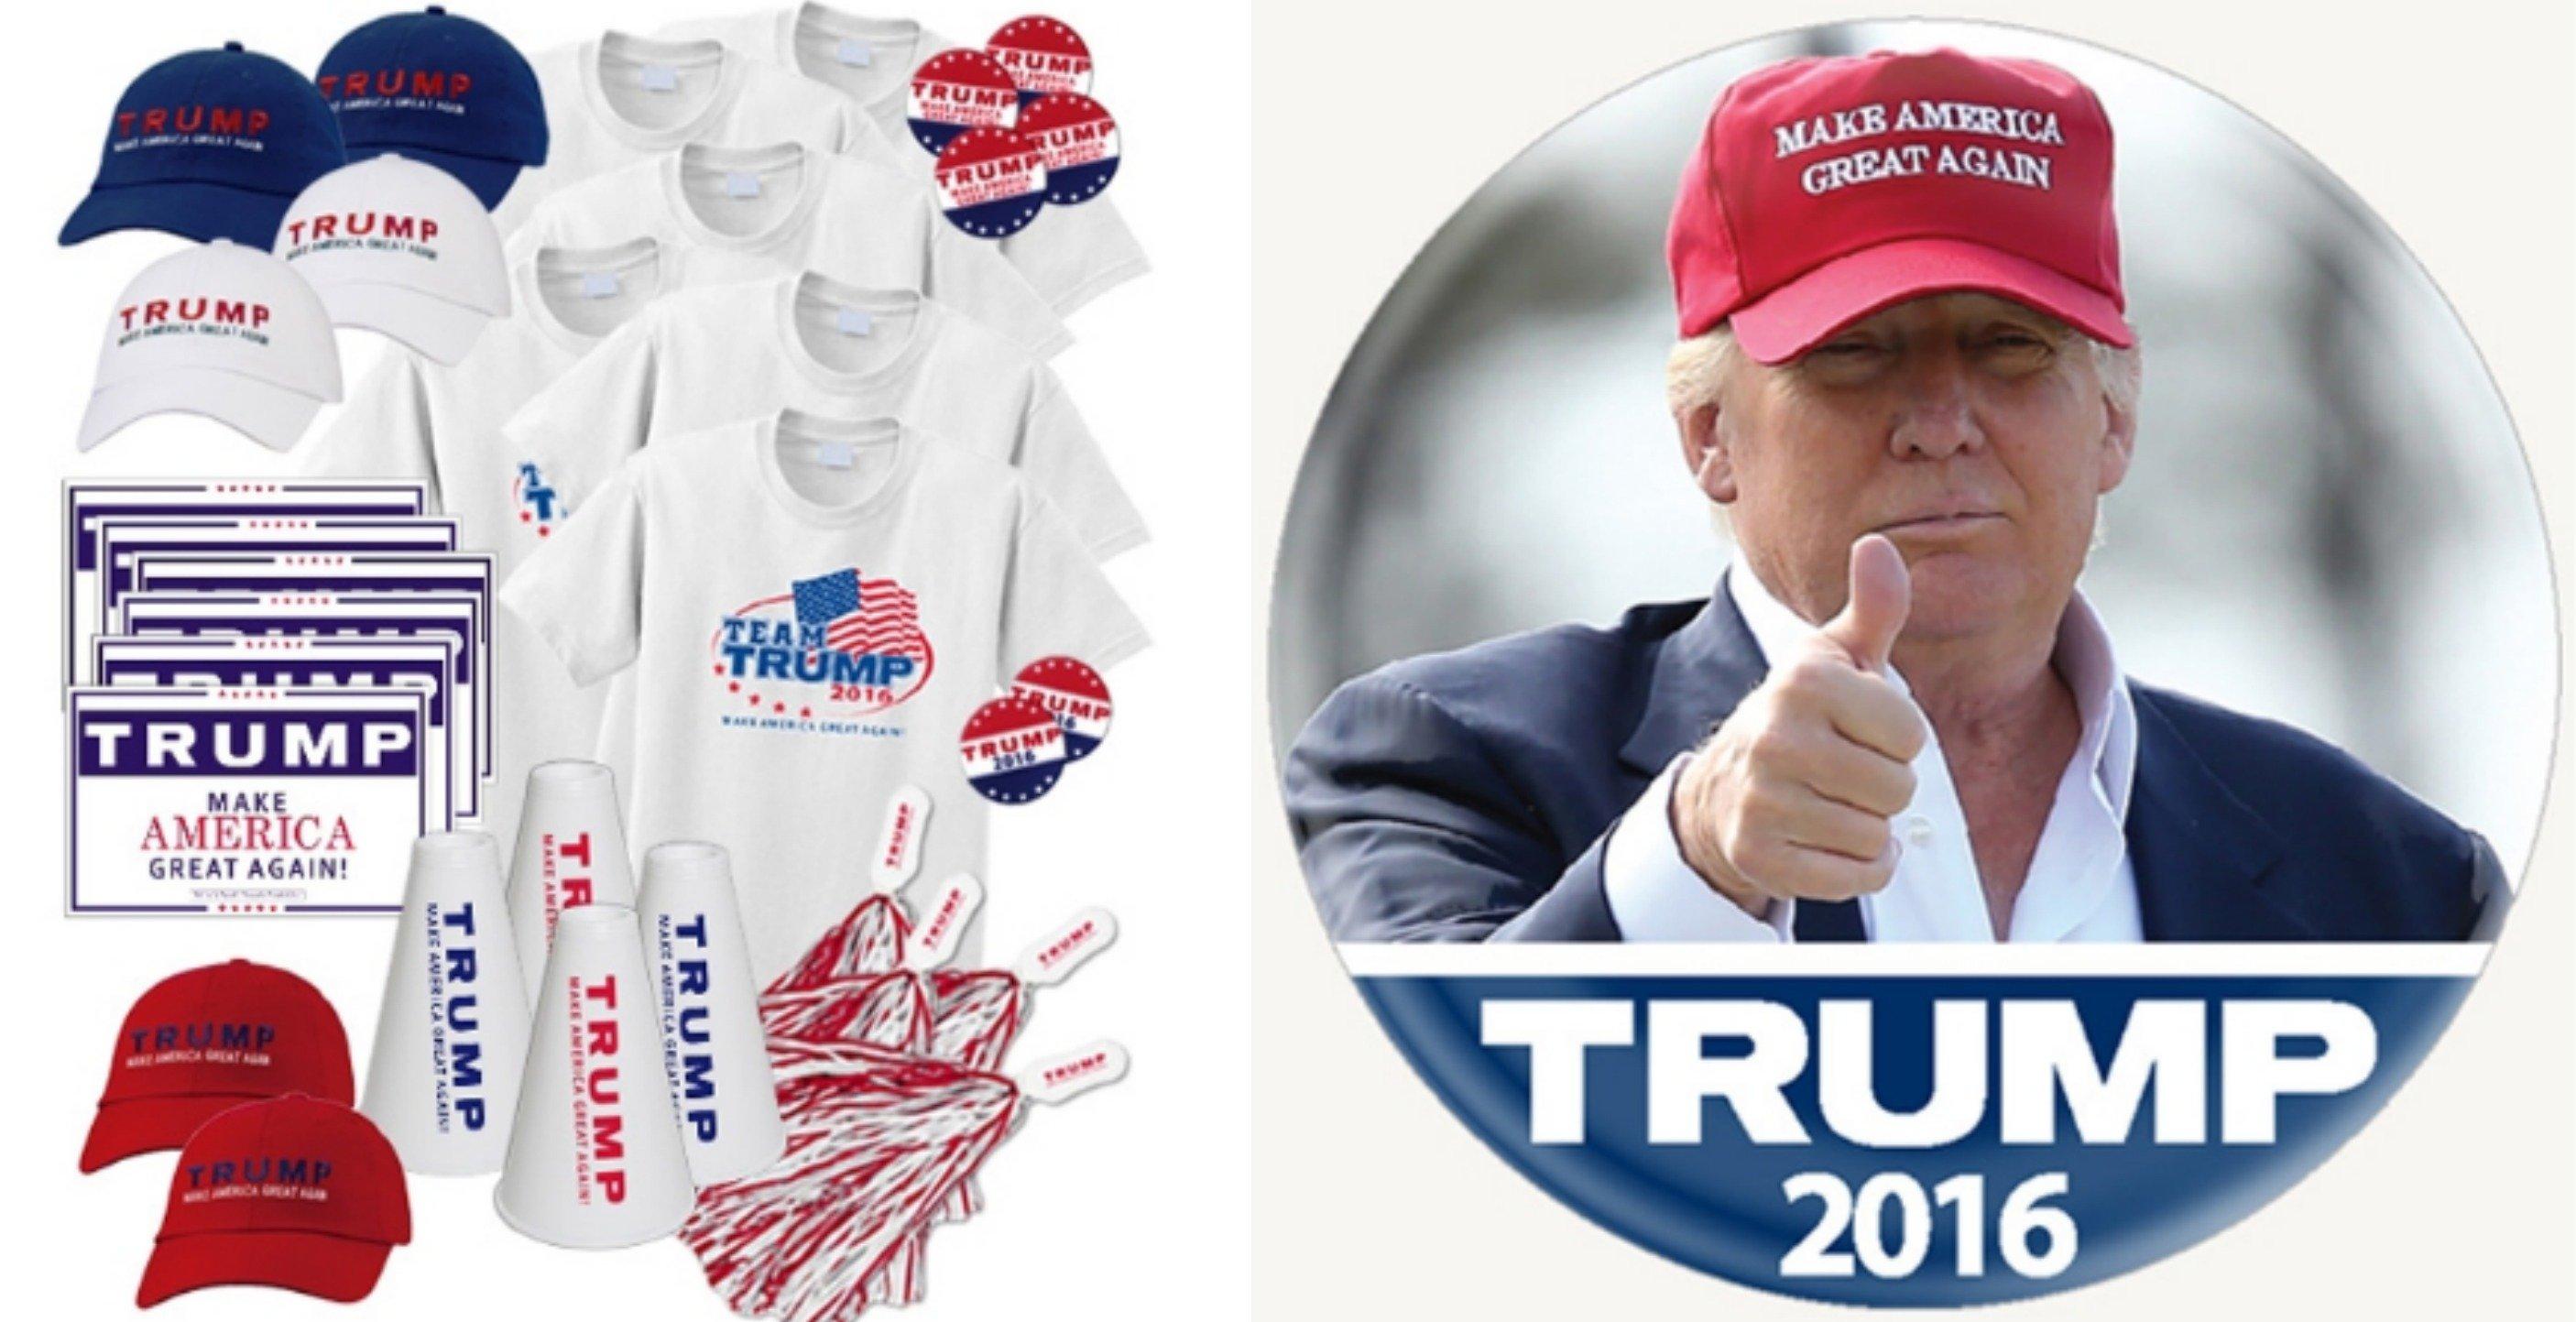 Trump vs. Clinton: How the Design of Their Merchandise ...